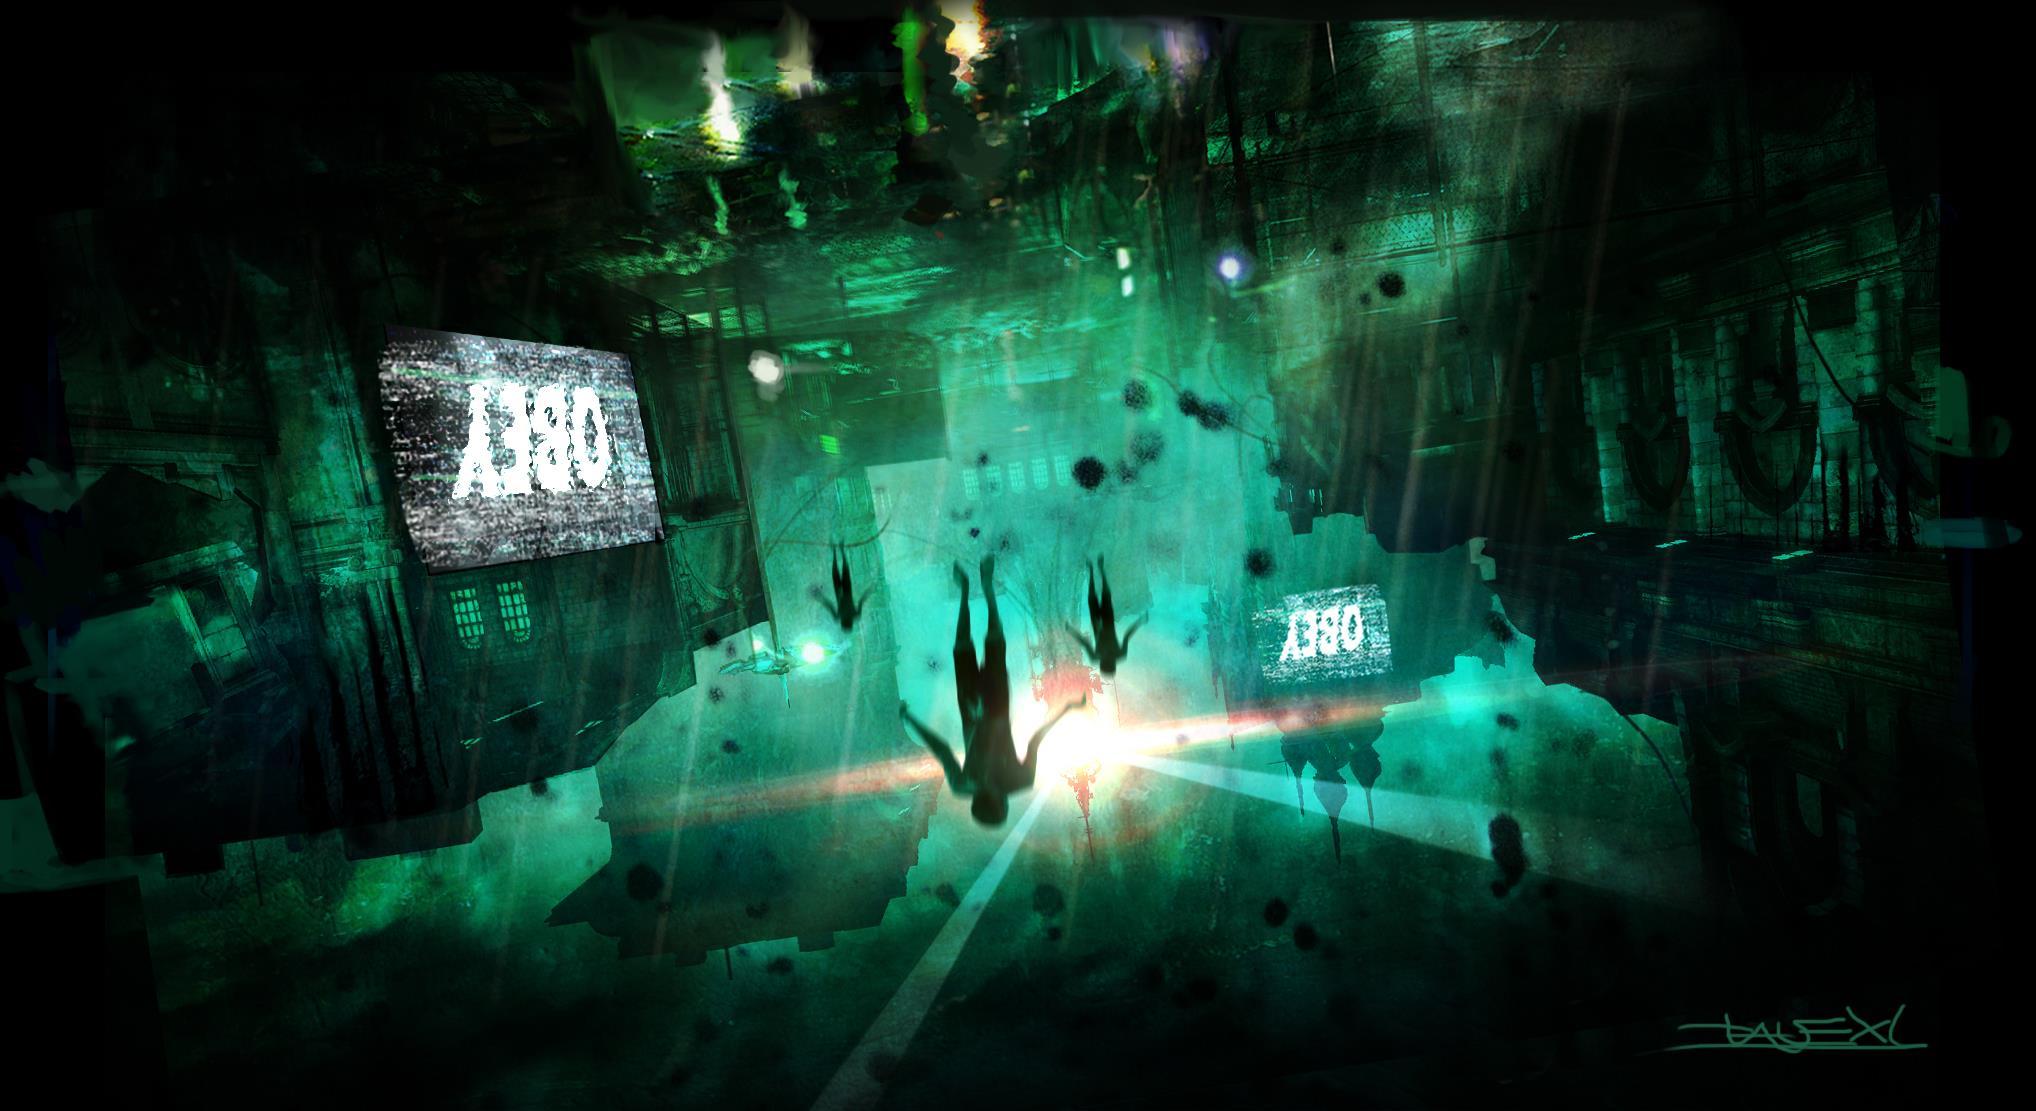 Devil May Cry Artworks 10 تصاویرهنری جدید Devil May Cry نشان از ذوق هنری در بازی میدهد